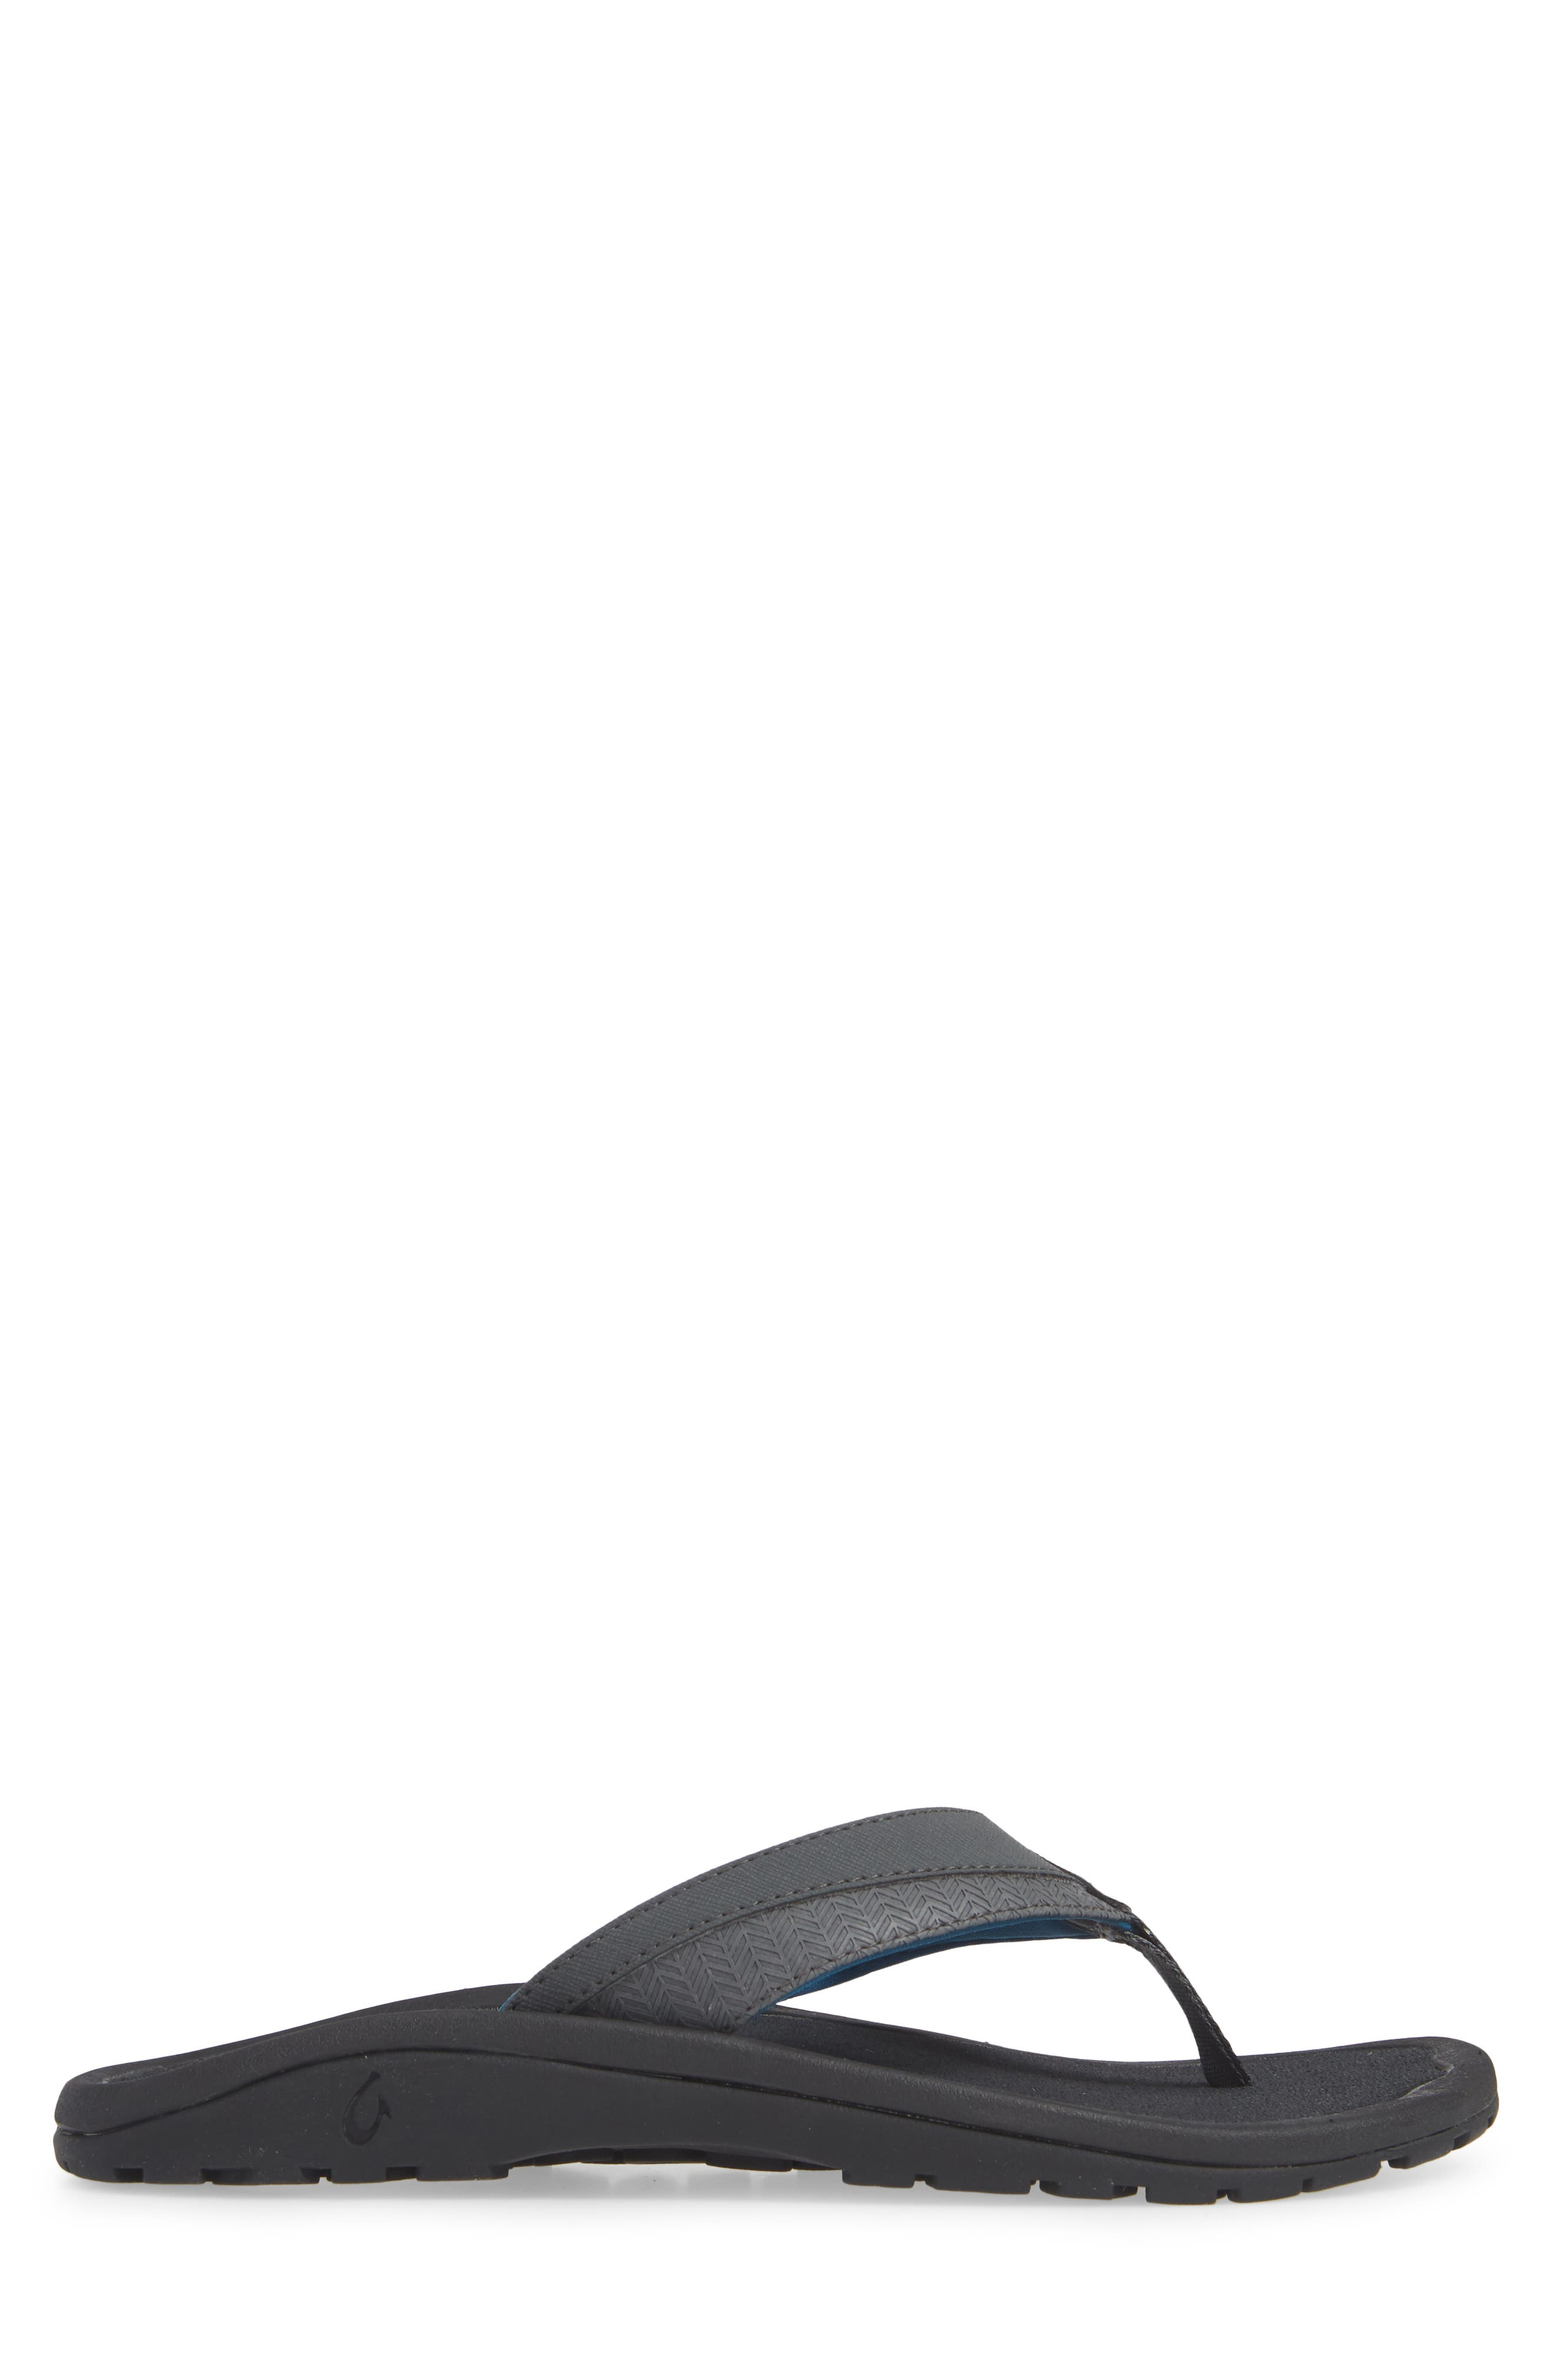 'Ohana Koa' Flip Flop,                             Alternate thumbnail 3, color,                             DARK SHADOW